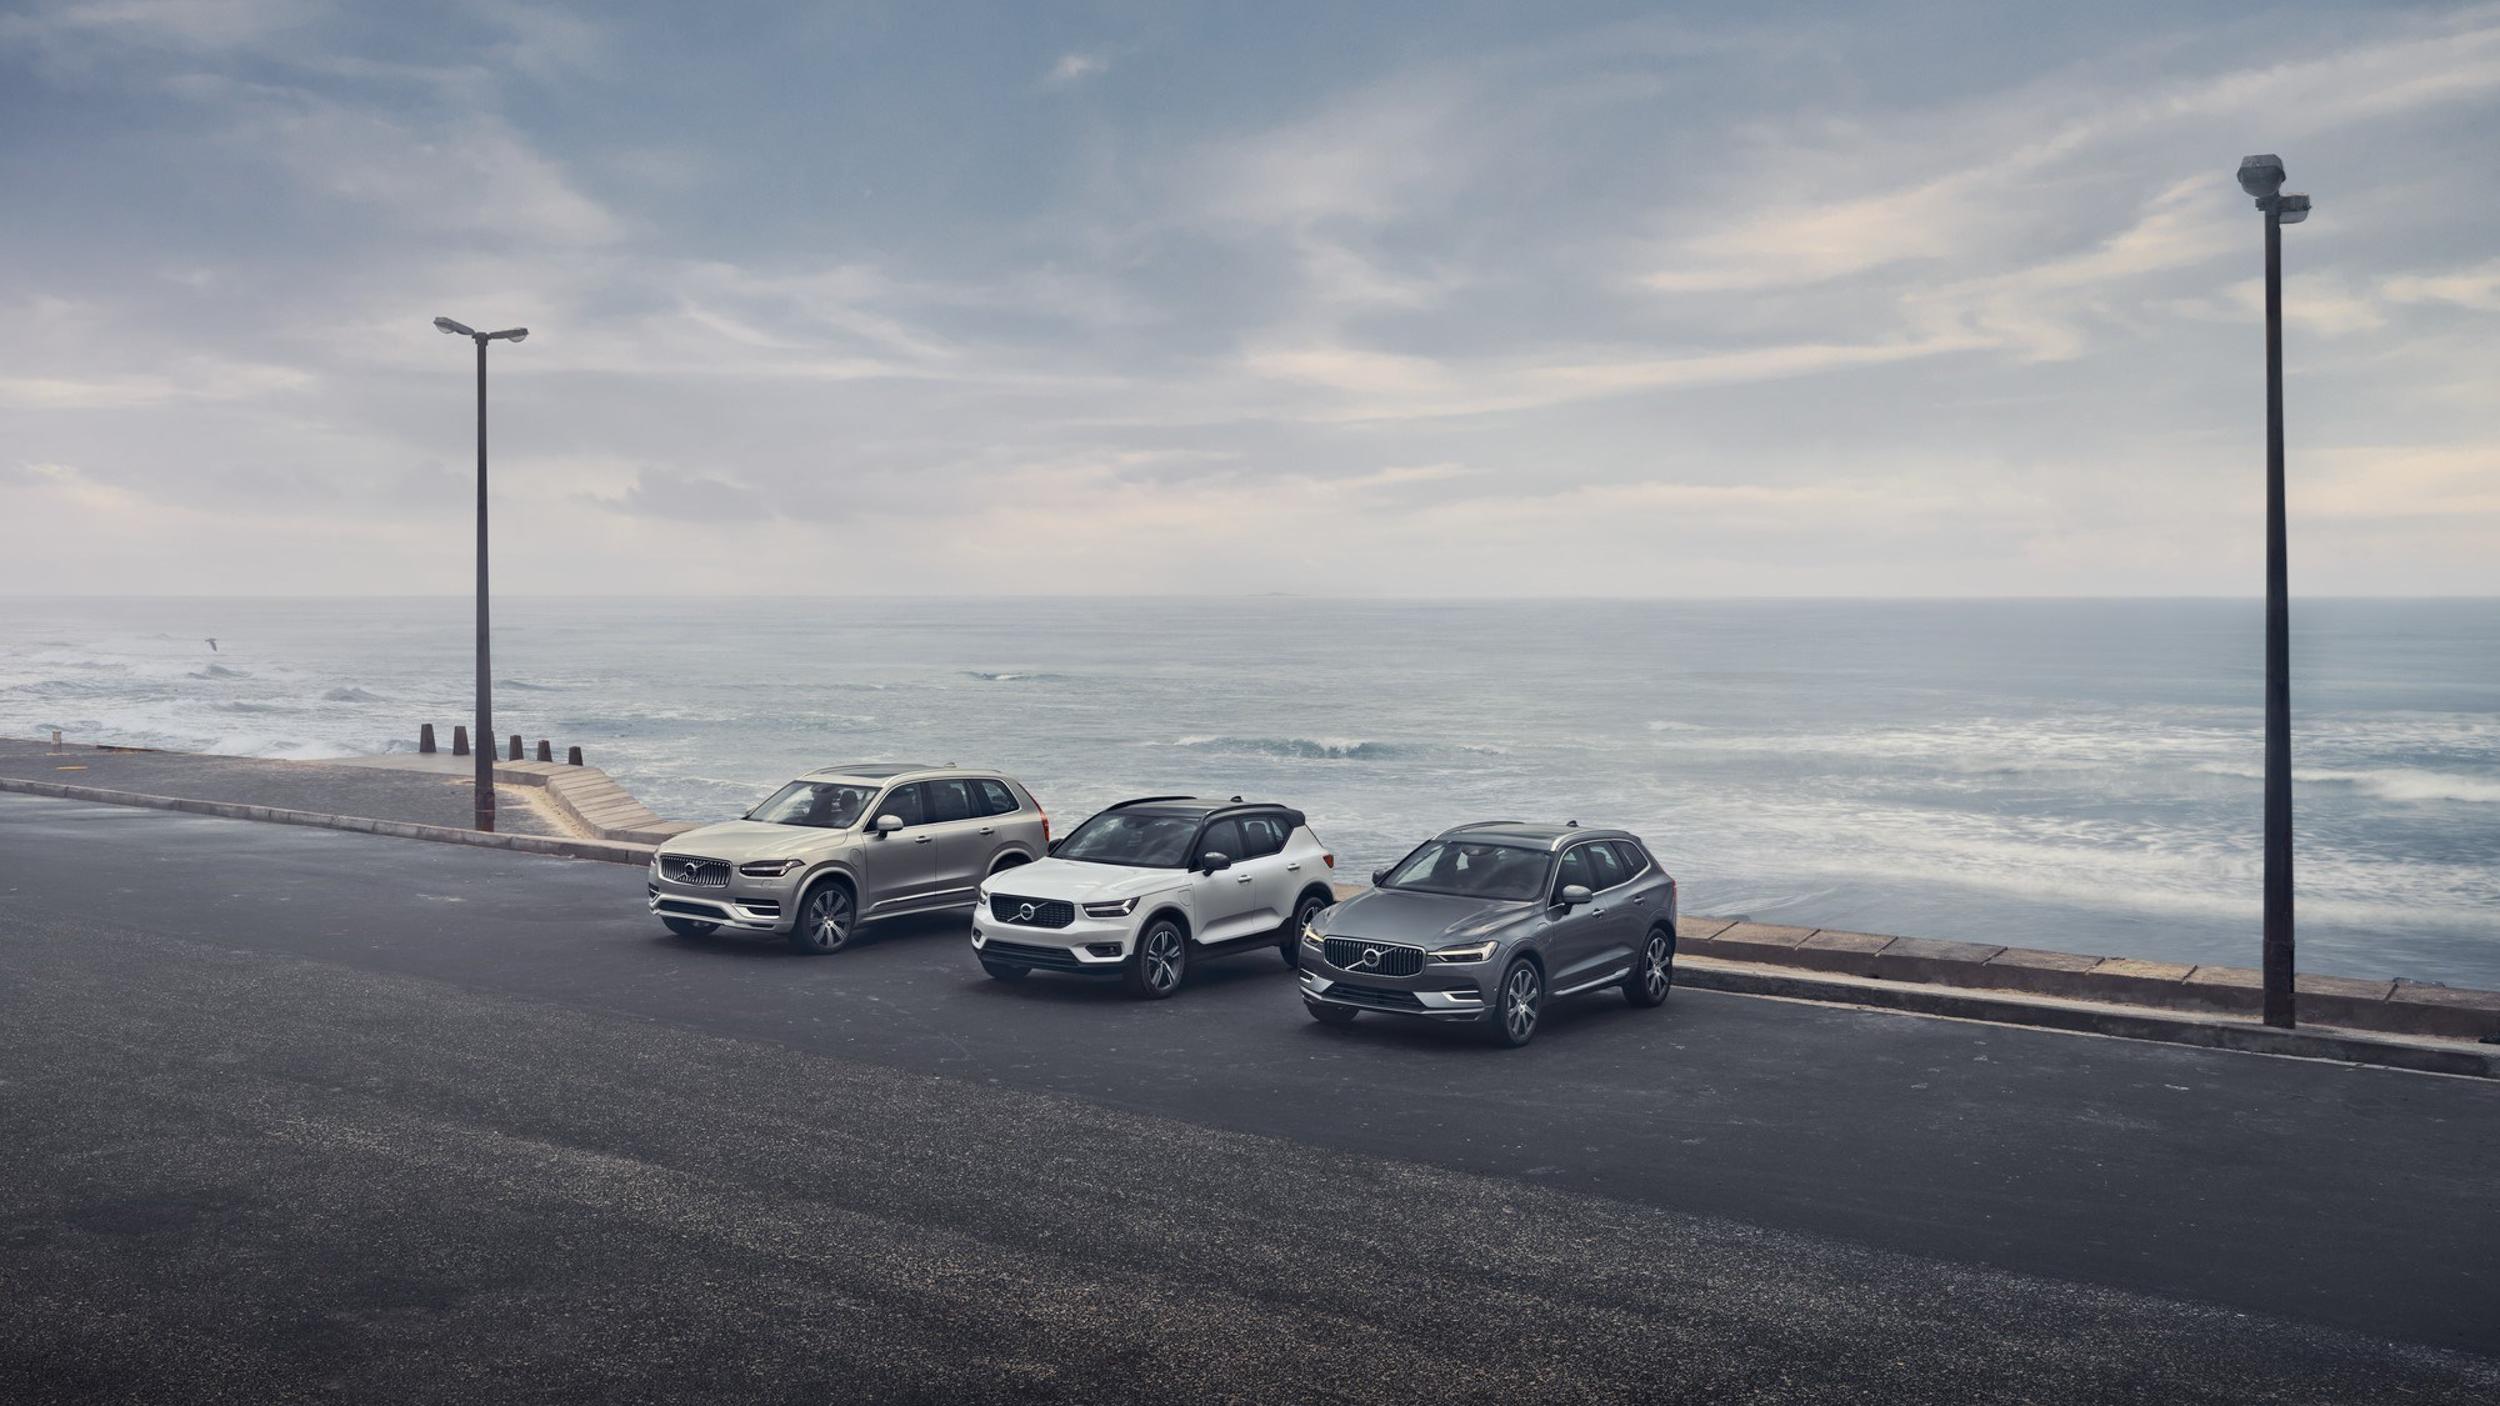 Volvo 銷售創新高!9 月成長率 25.99% 勇冠所有豪華品牌